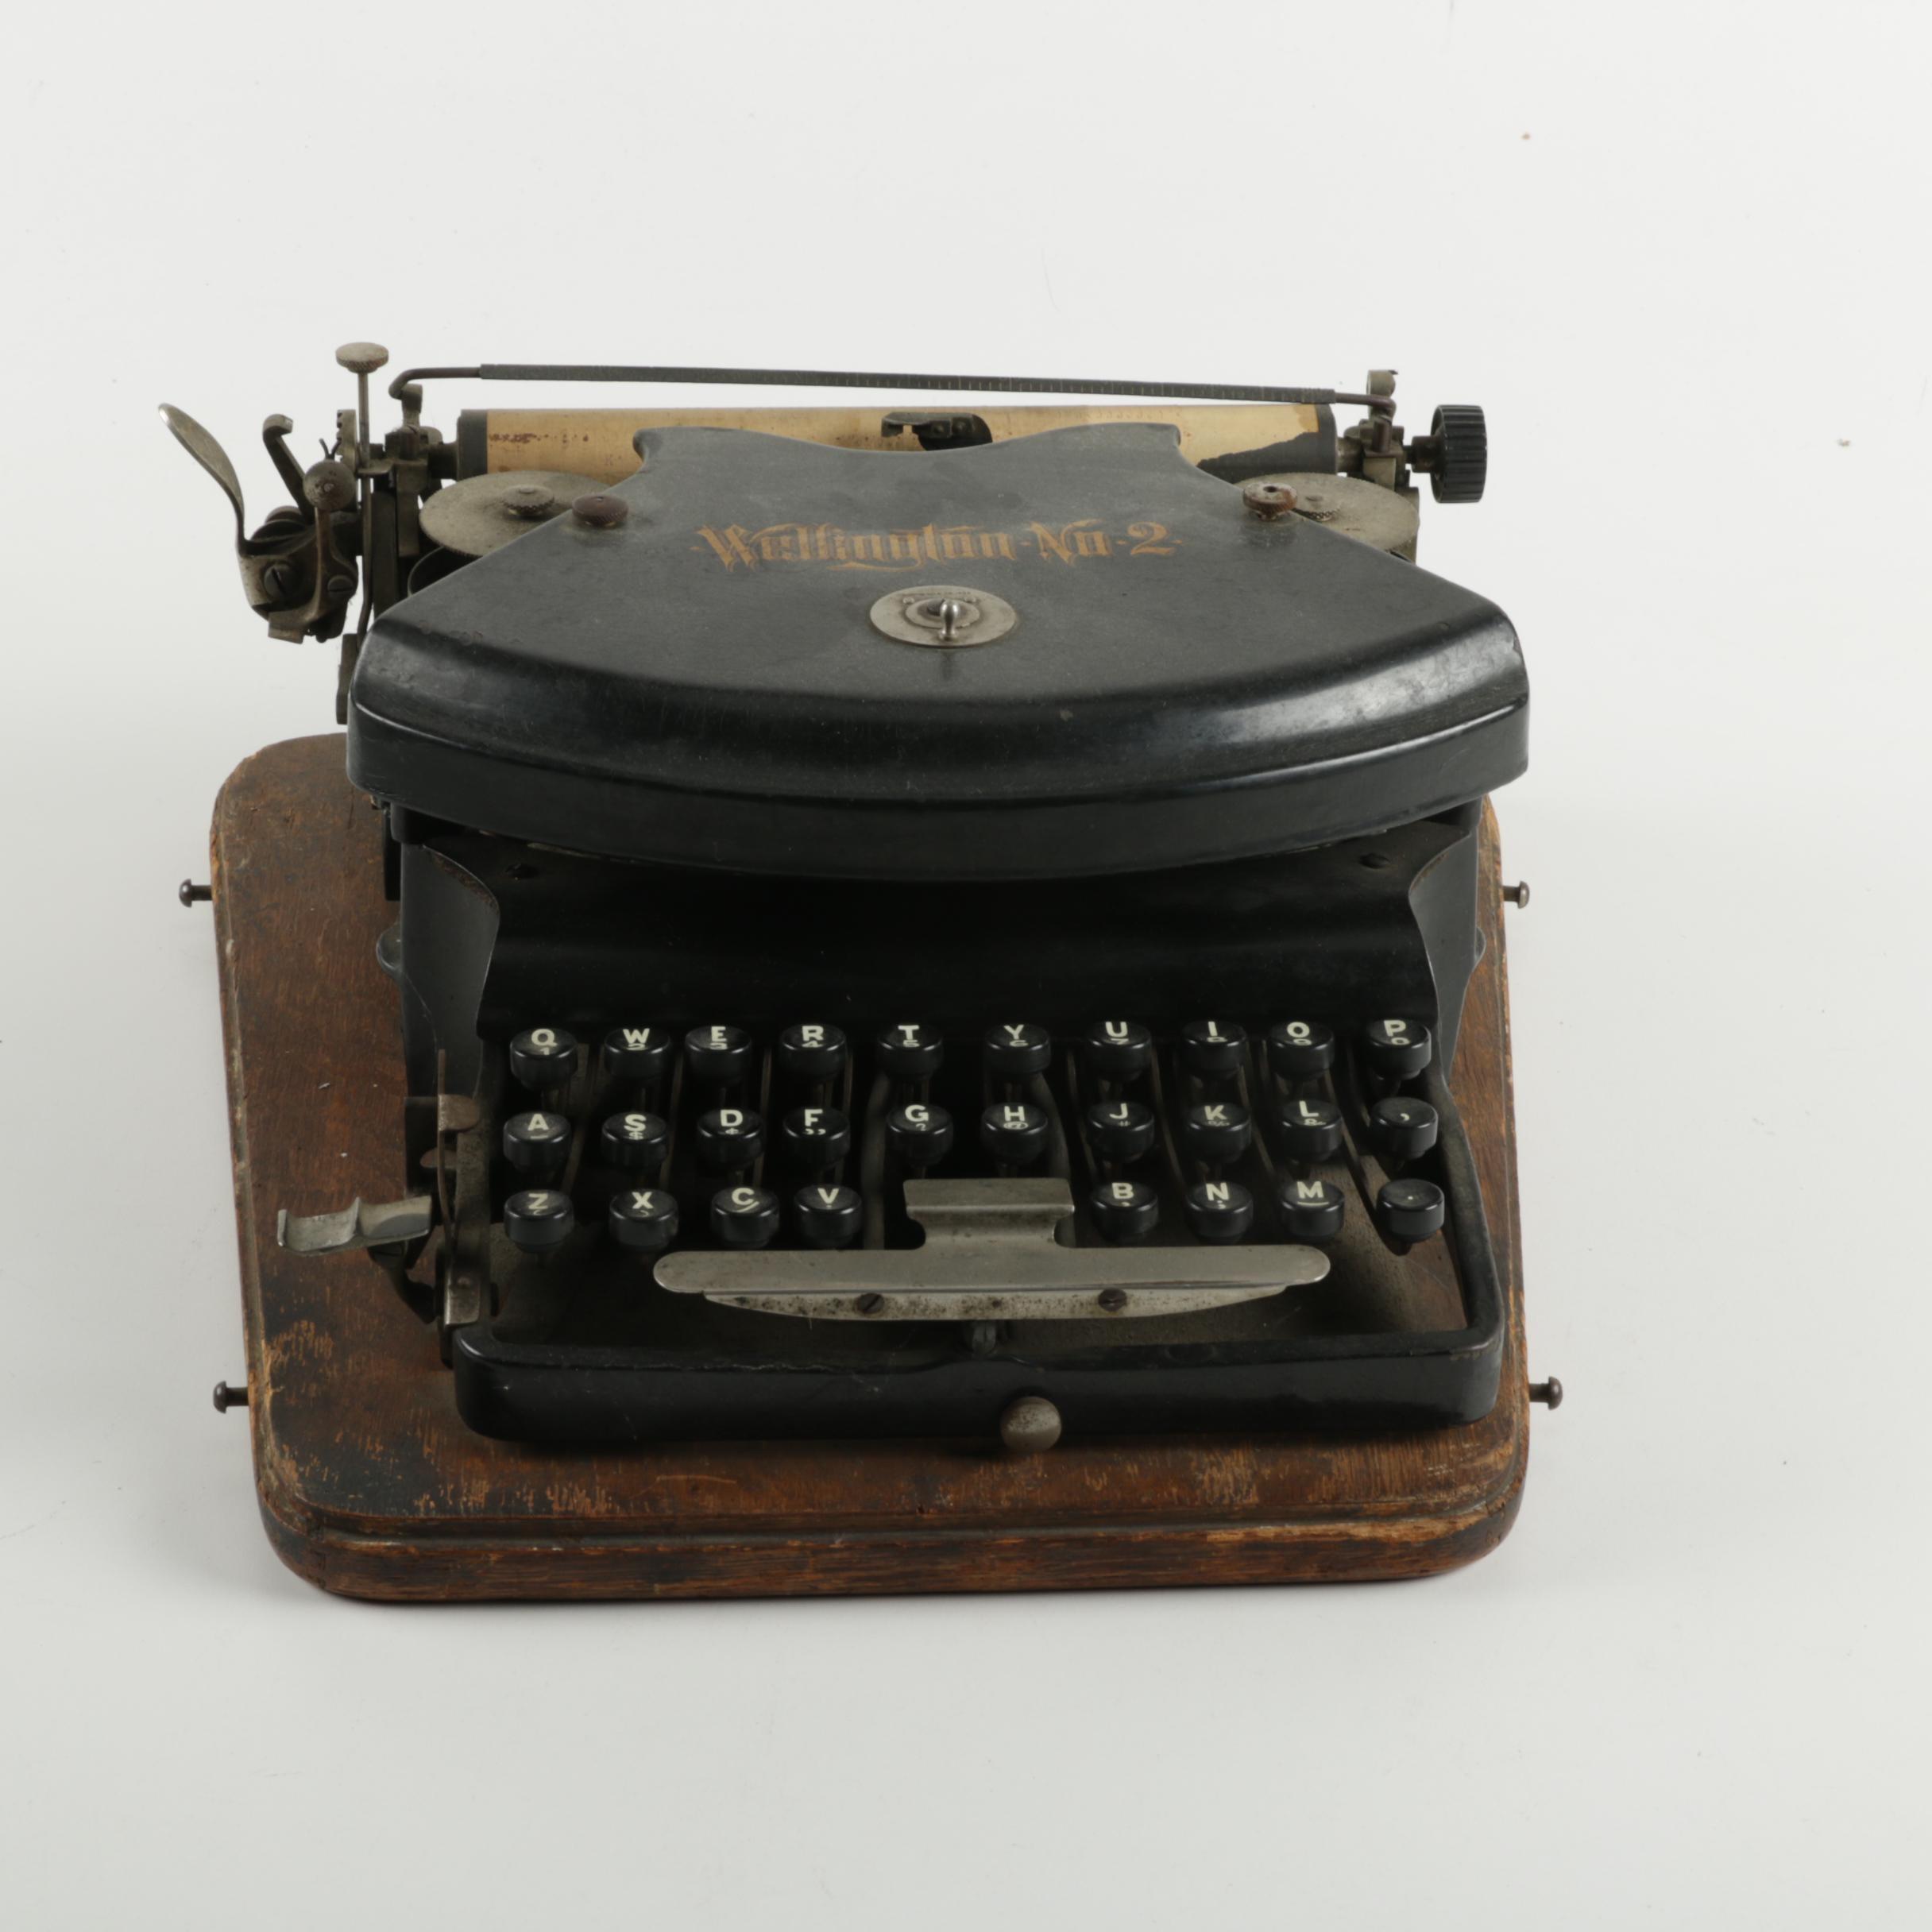 Wellington No. 2 Typewriter with Case